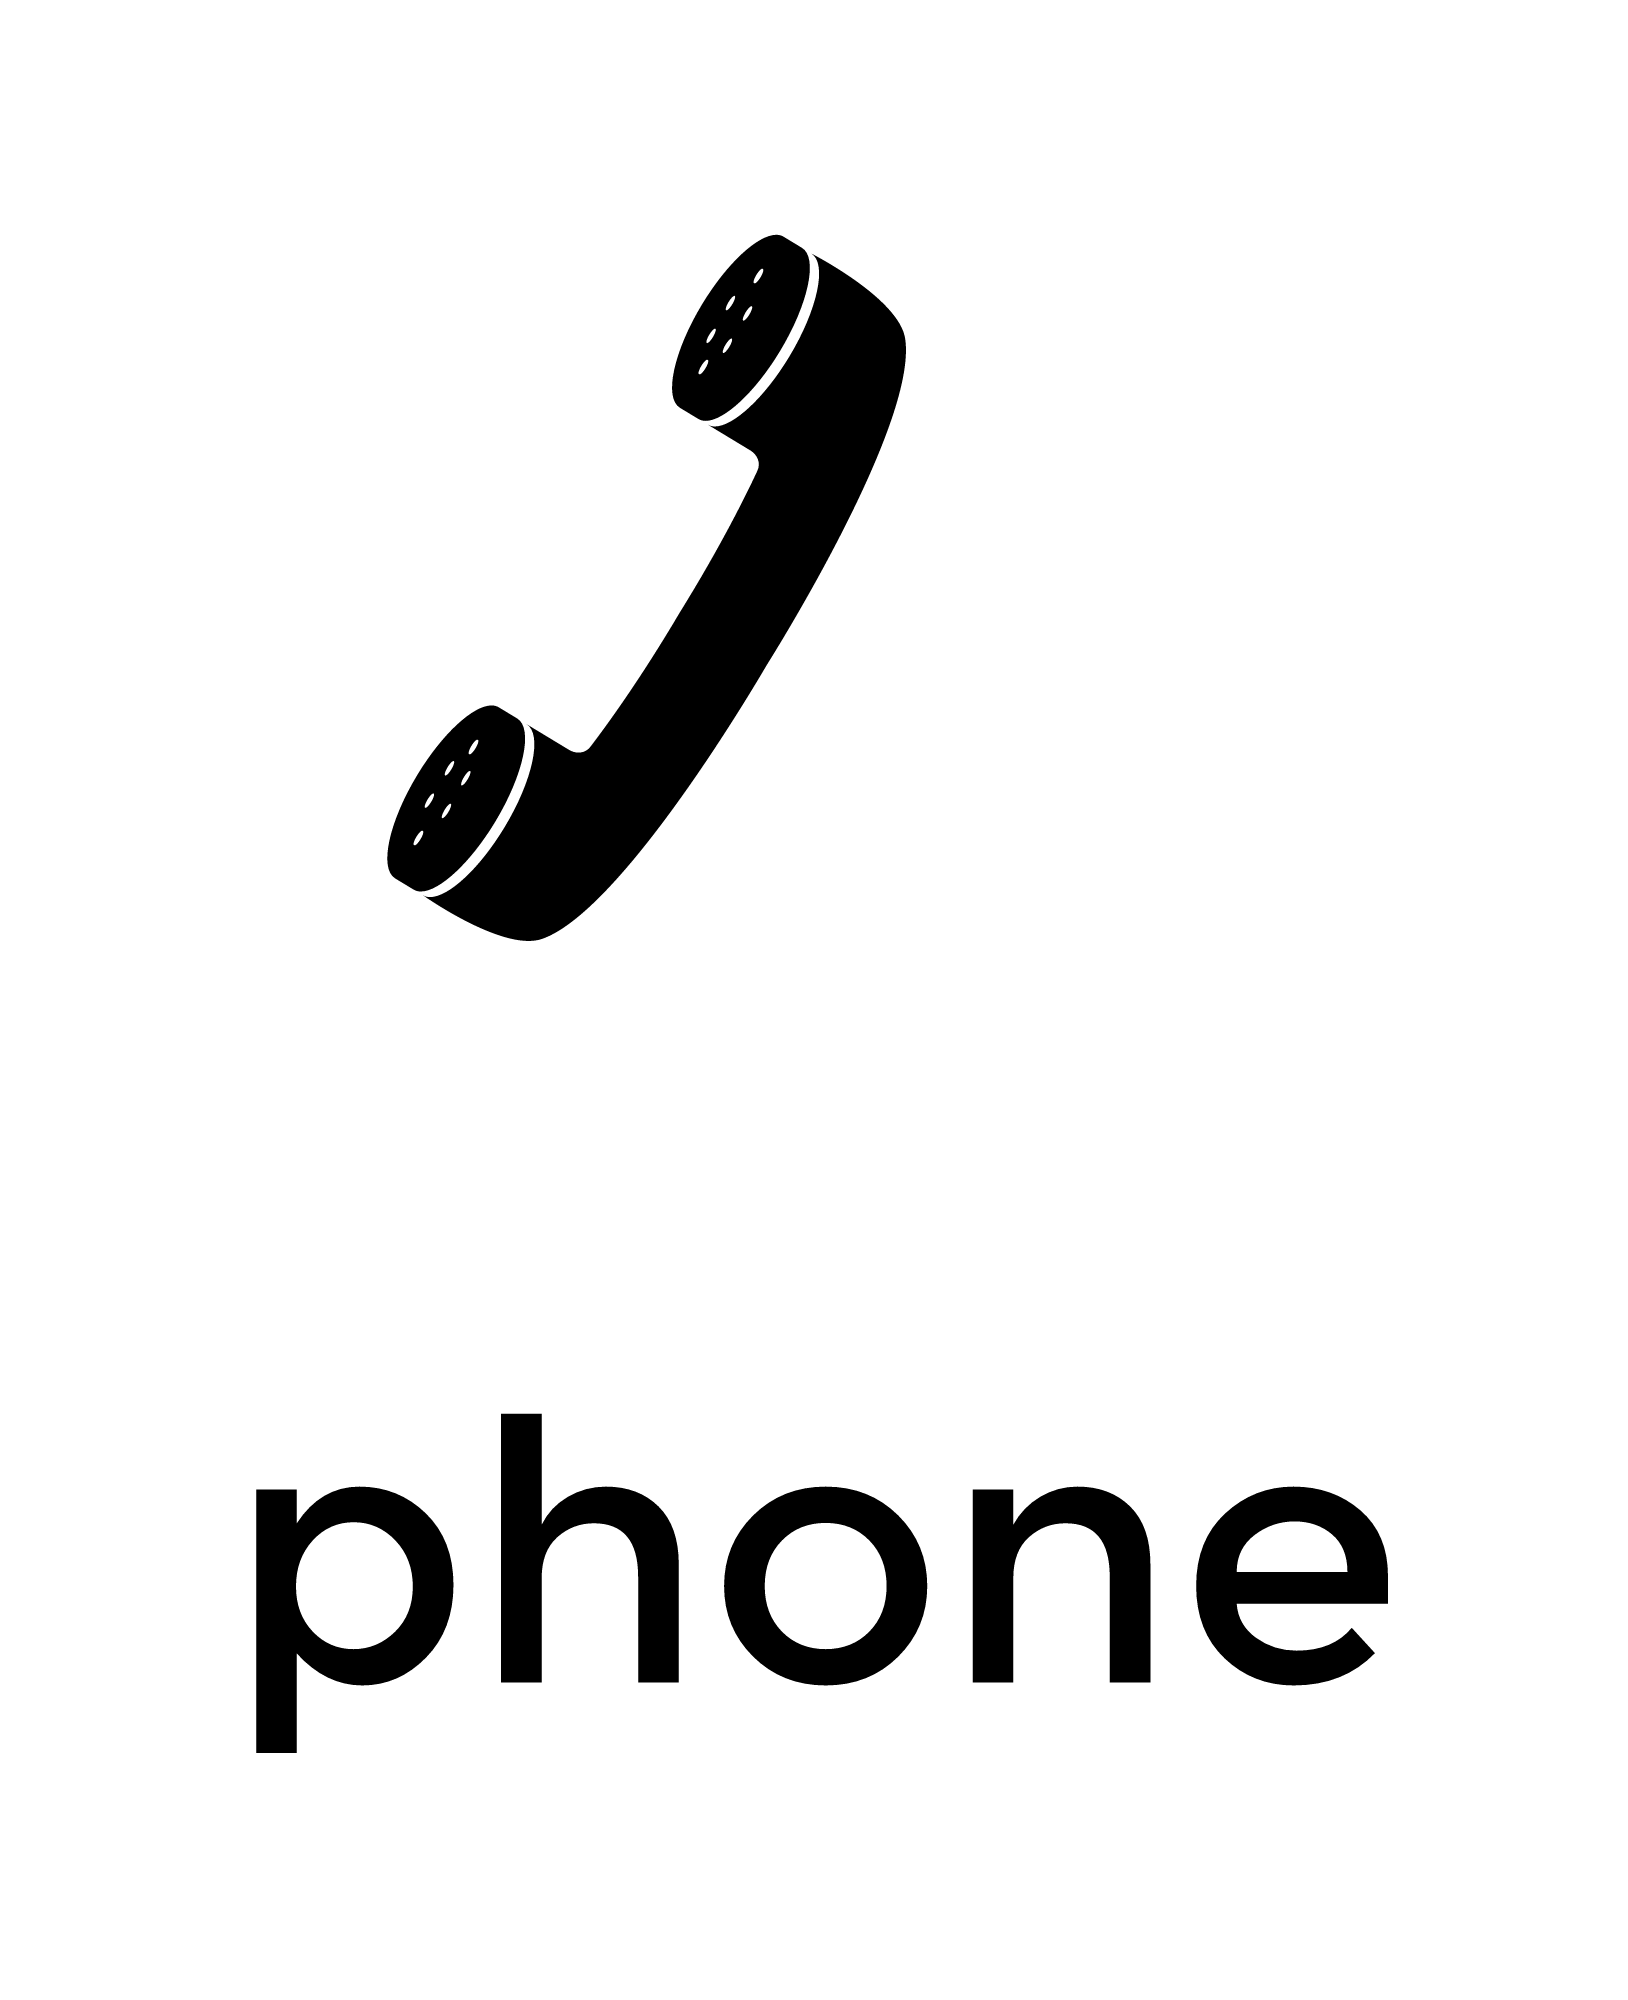 phone-logo-black.png